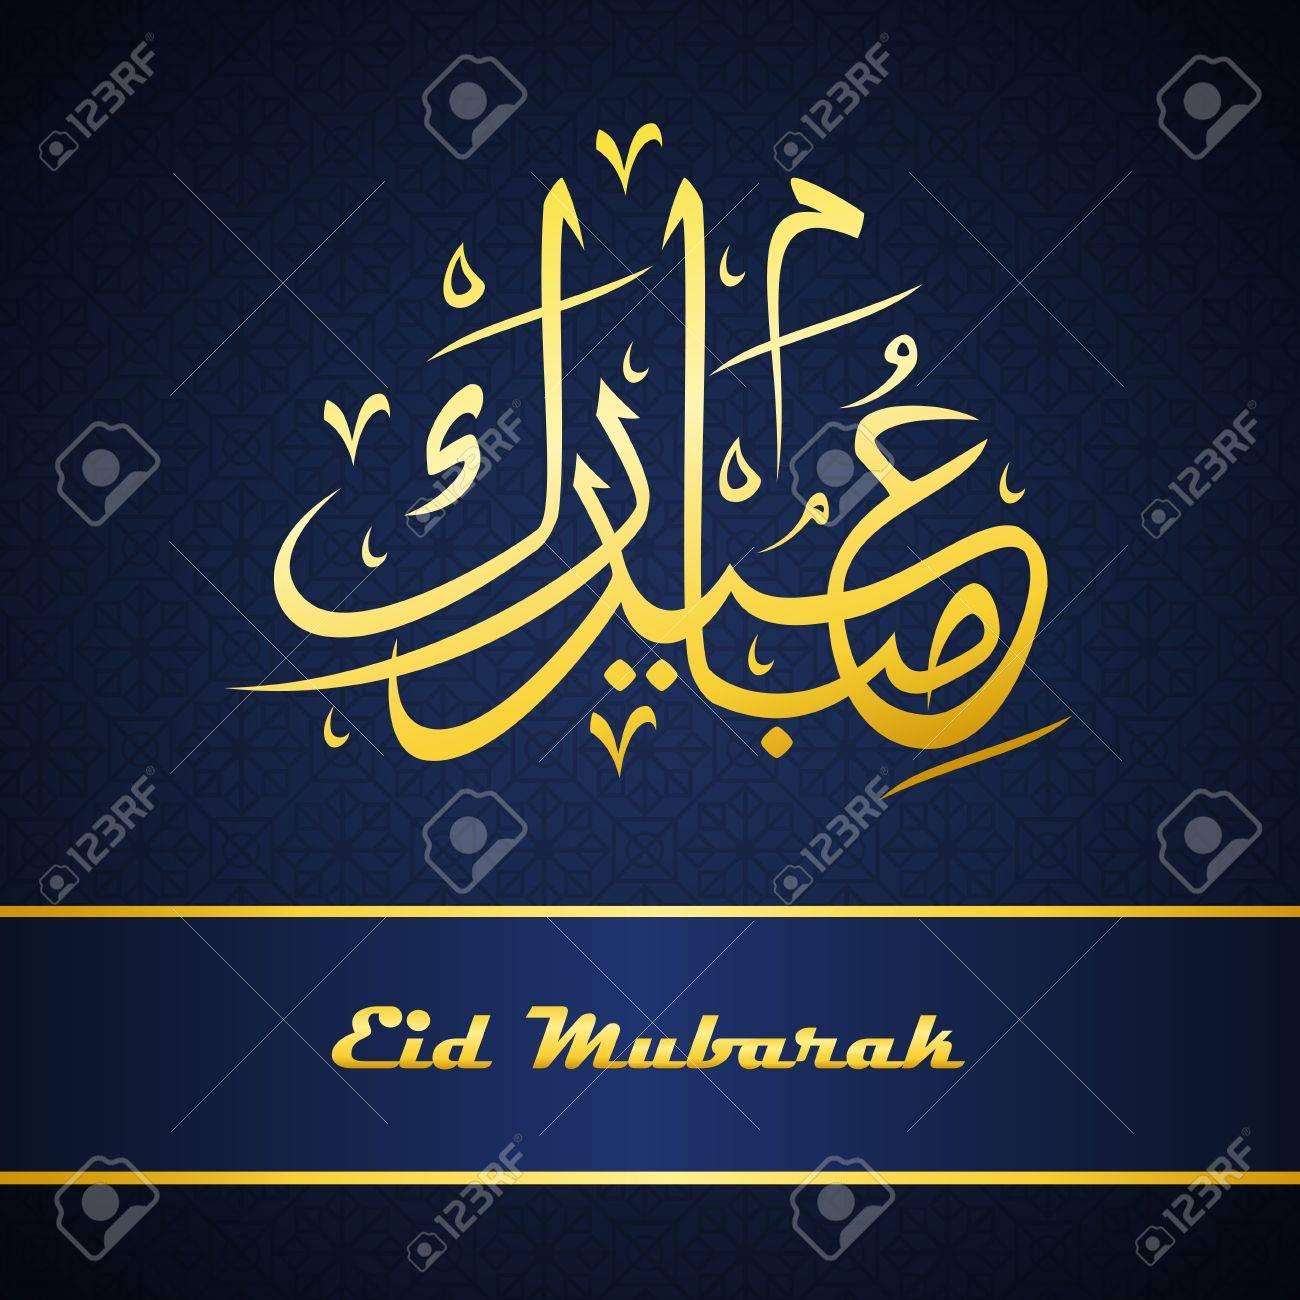 Eid Mubarak Greeting Card With Arabic Islamic Calligraphy Royalty